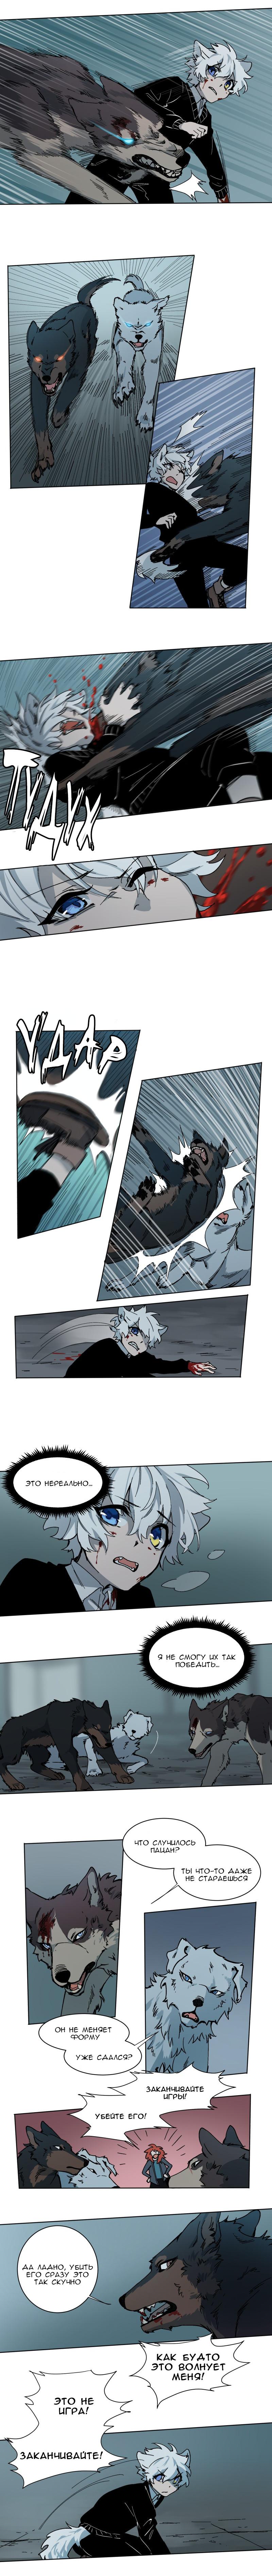 https://r1.ninemanga.com/comics/pic2/38/32806/411988/1524571697814.jpg Page 5